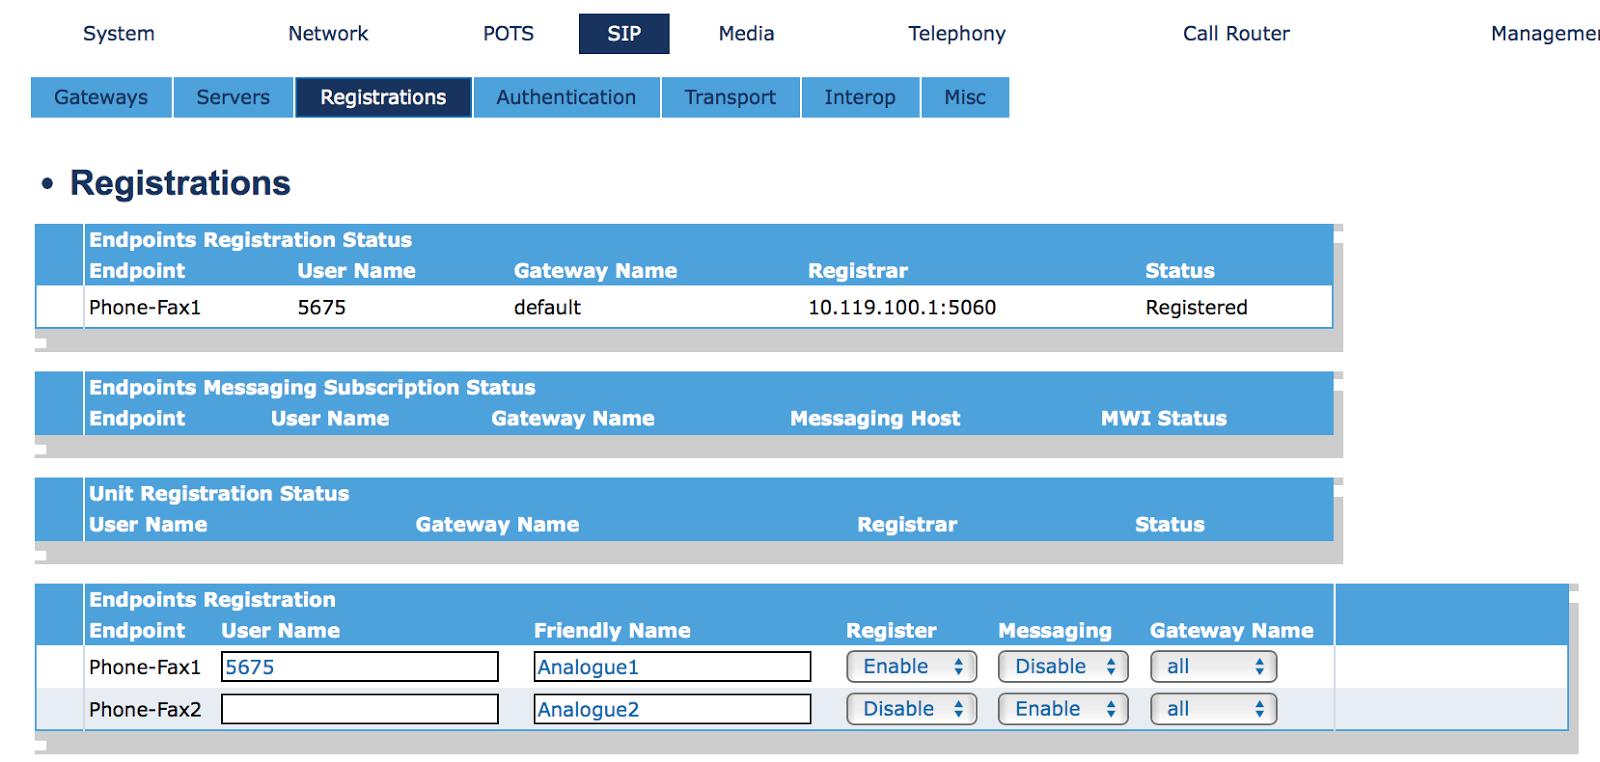 jamsignal: Mitel TA7102 SIP setup with MCD